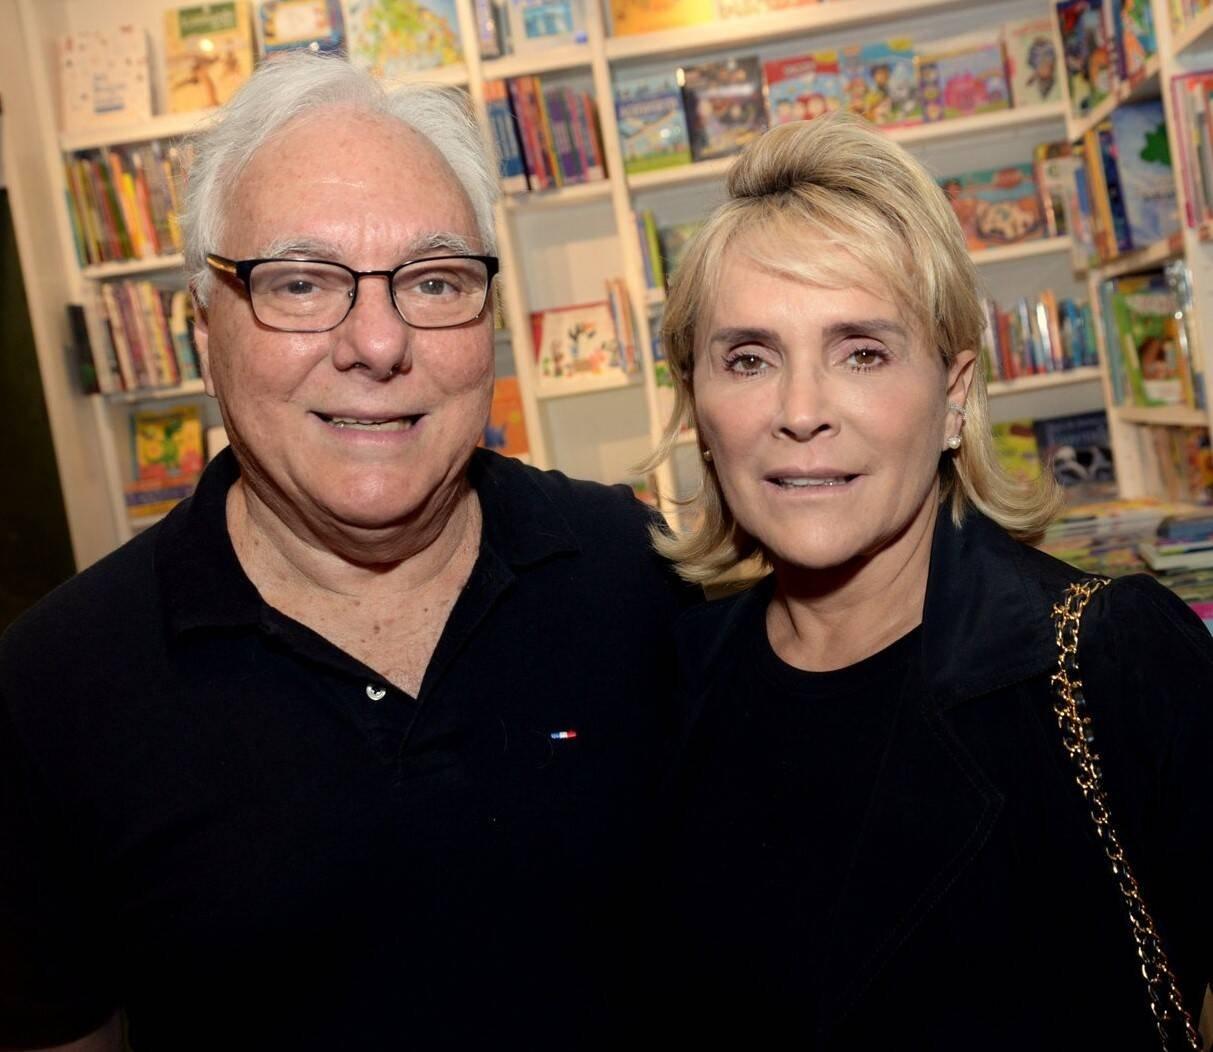 Luiz Antonio Secco e Denise Bastos /Foto: Leo Marinho